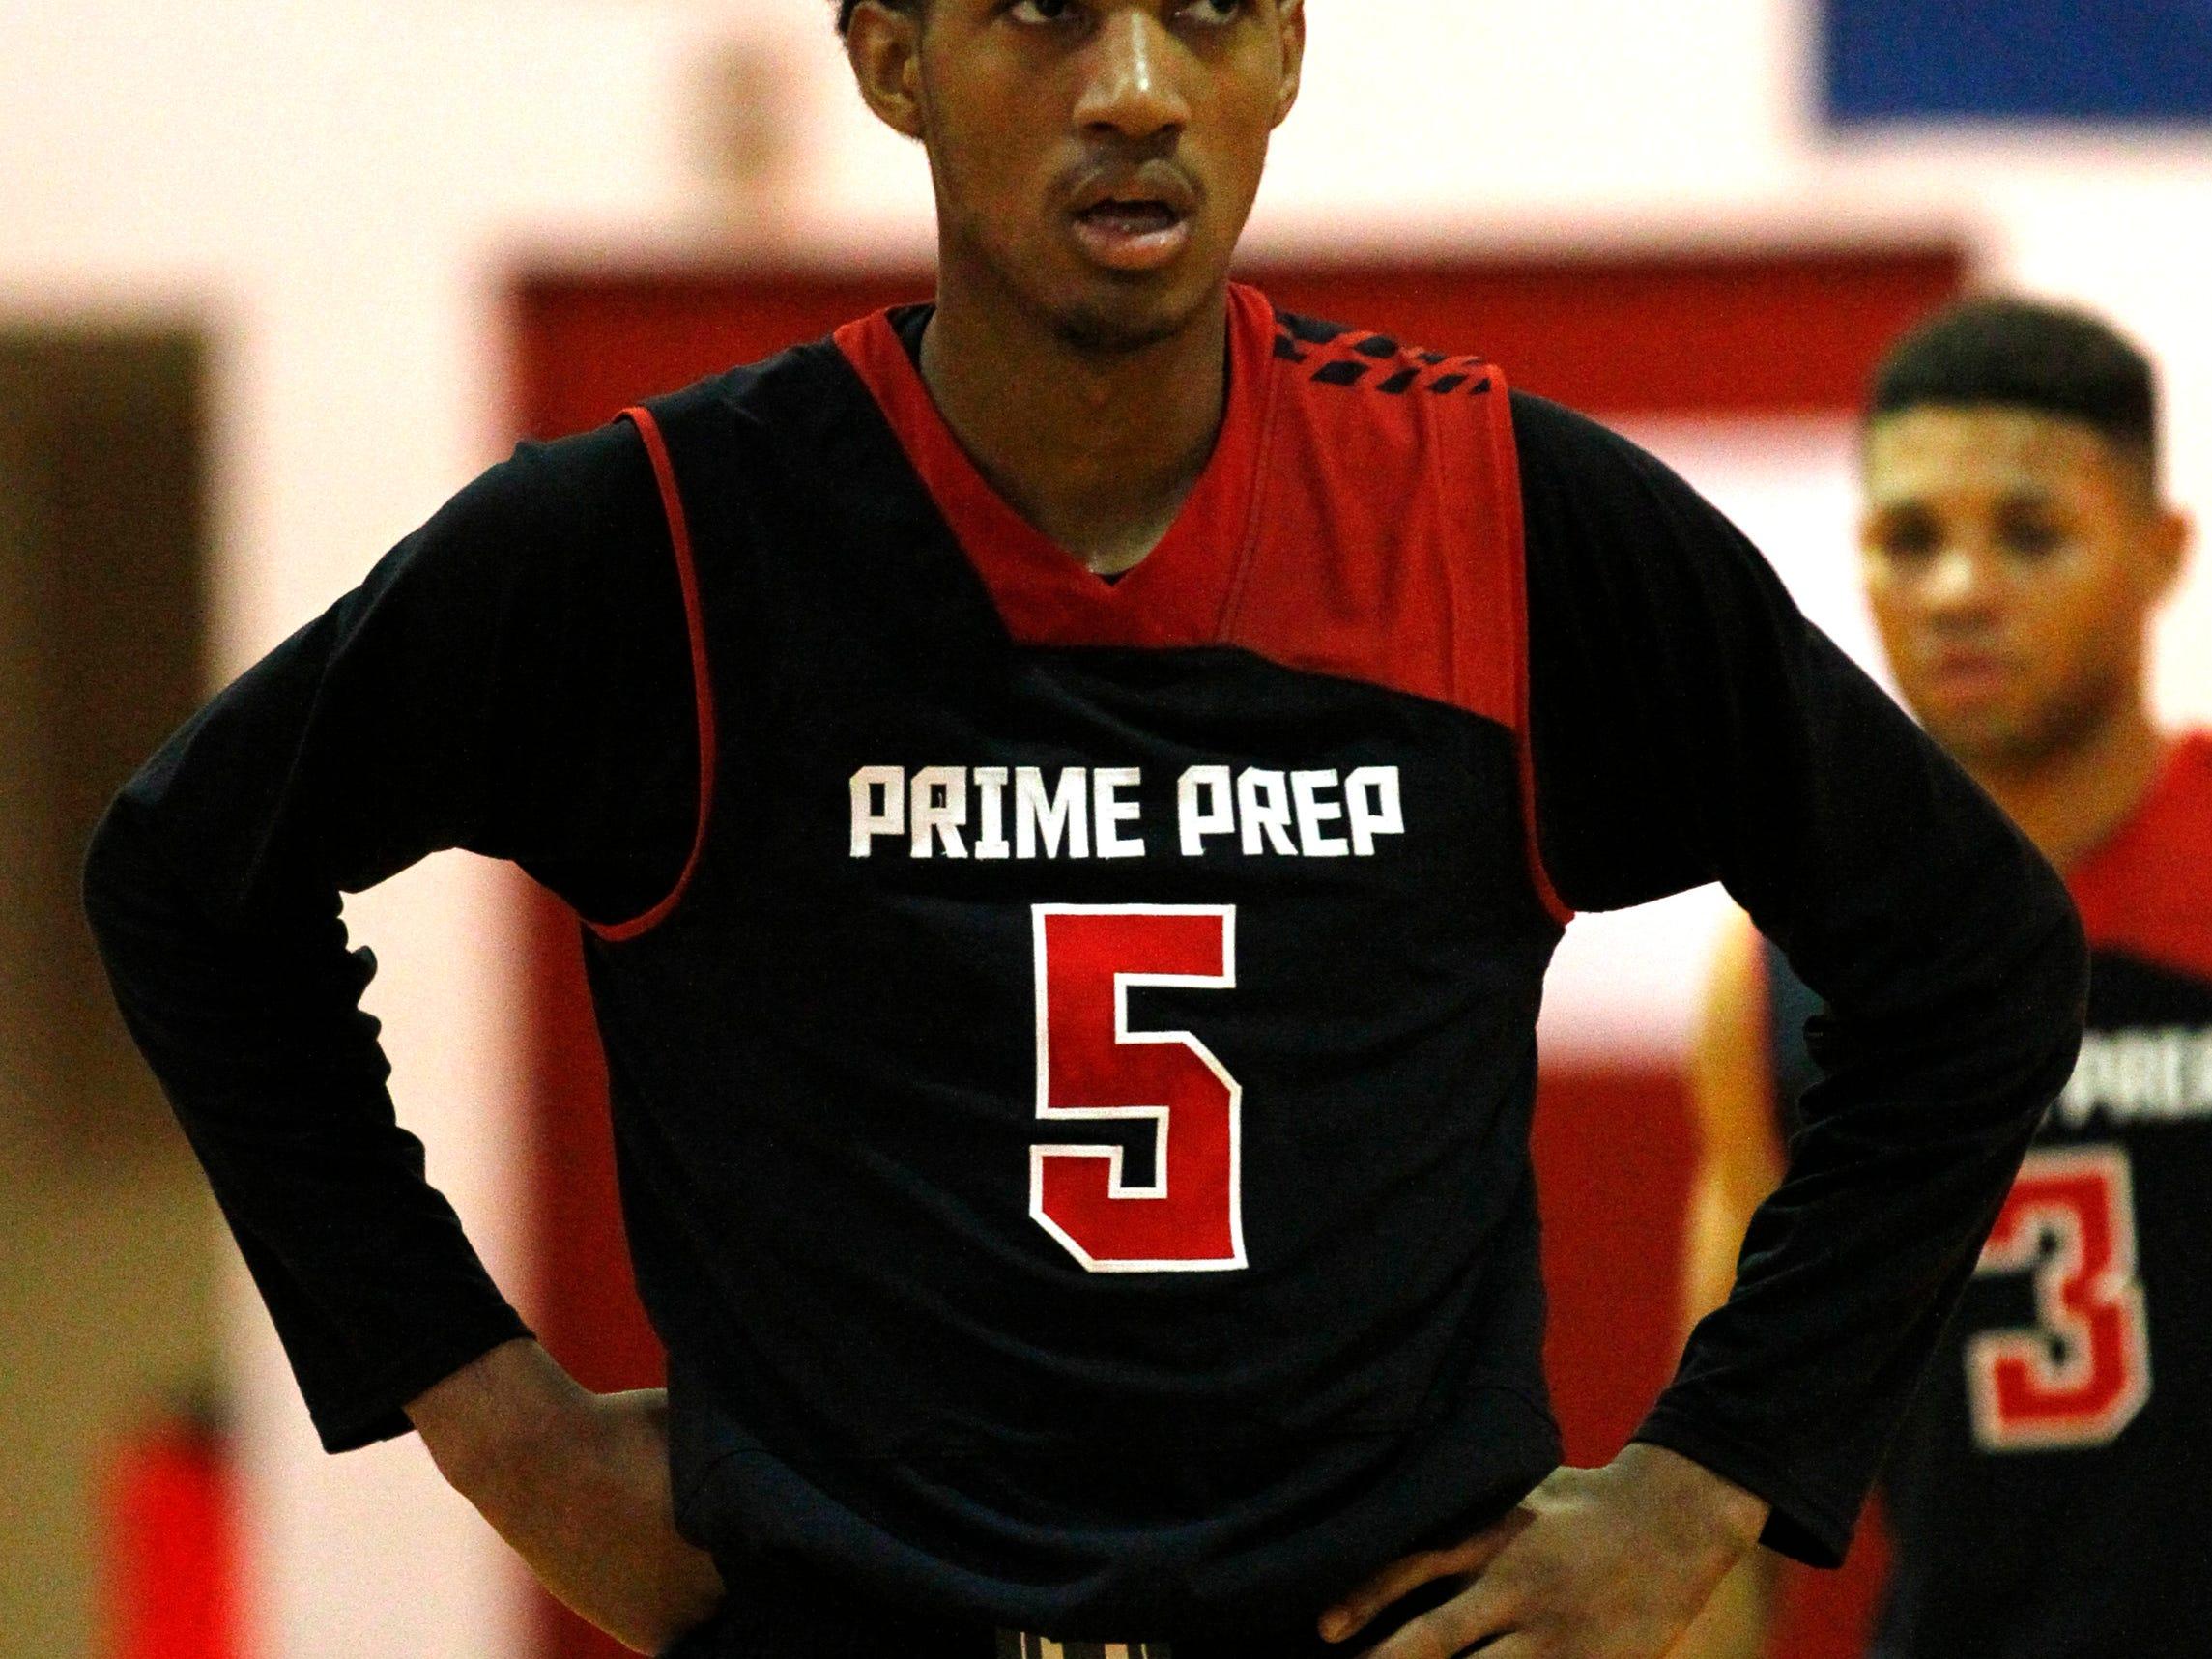 Prime Prep of Dallas' Terrance Ferguson (5) on the basketball court at Seneca High School in Louisville, Kentucky. December 1, 2014